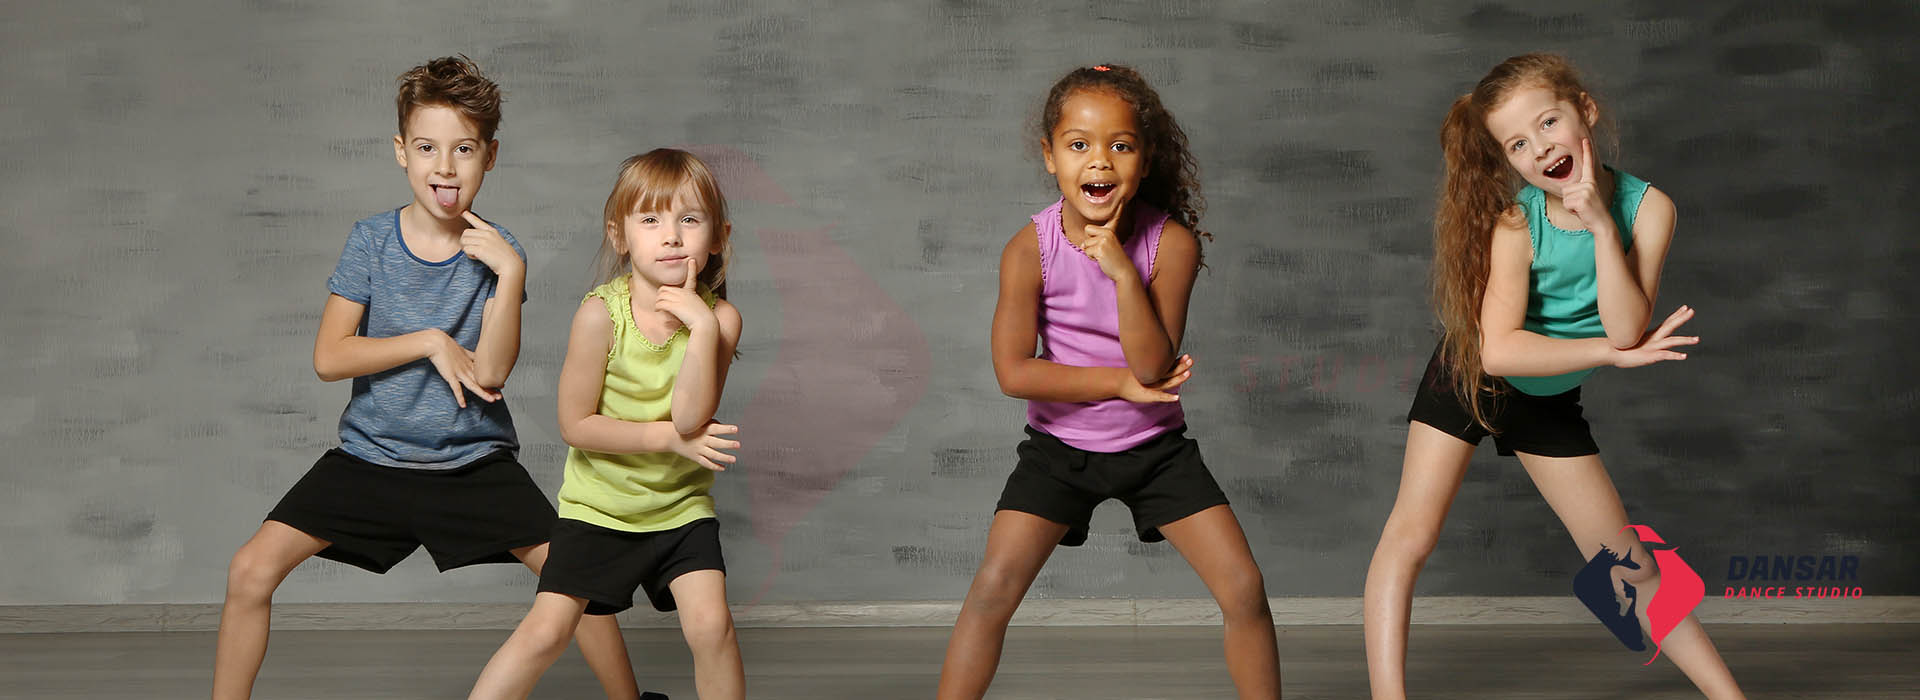 escuela-baile-urbano-valencia